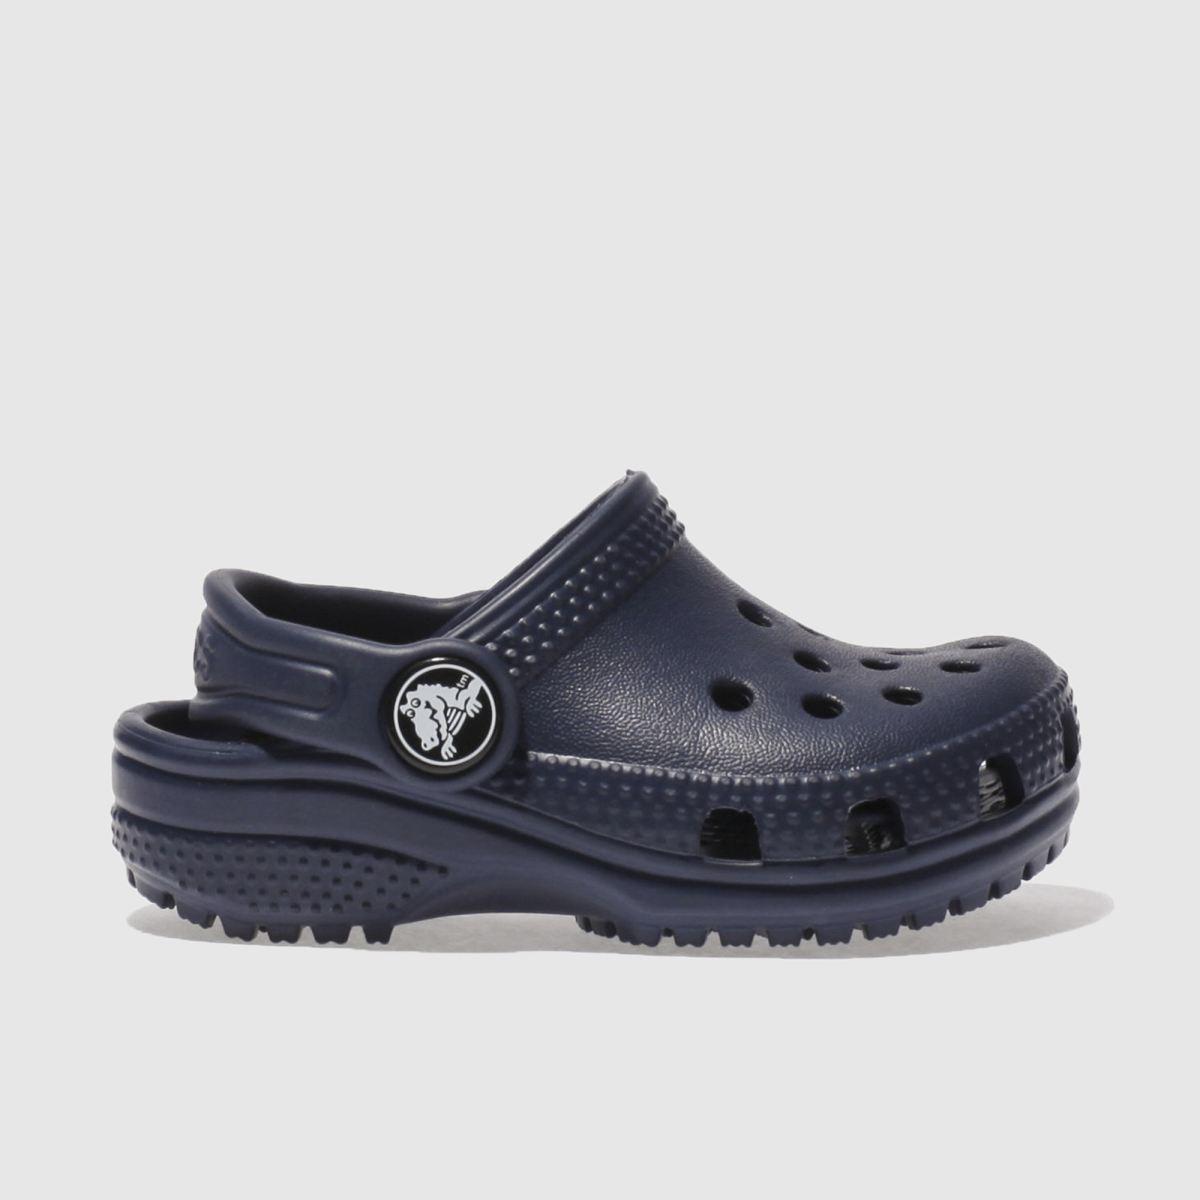 4d8b63e9b Crocs Navy Classic Clog Trainers Toddler - Schuh at Westquay - Shop Online